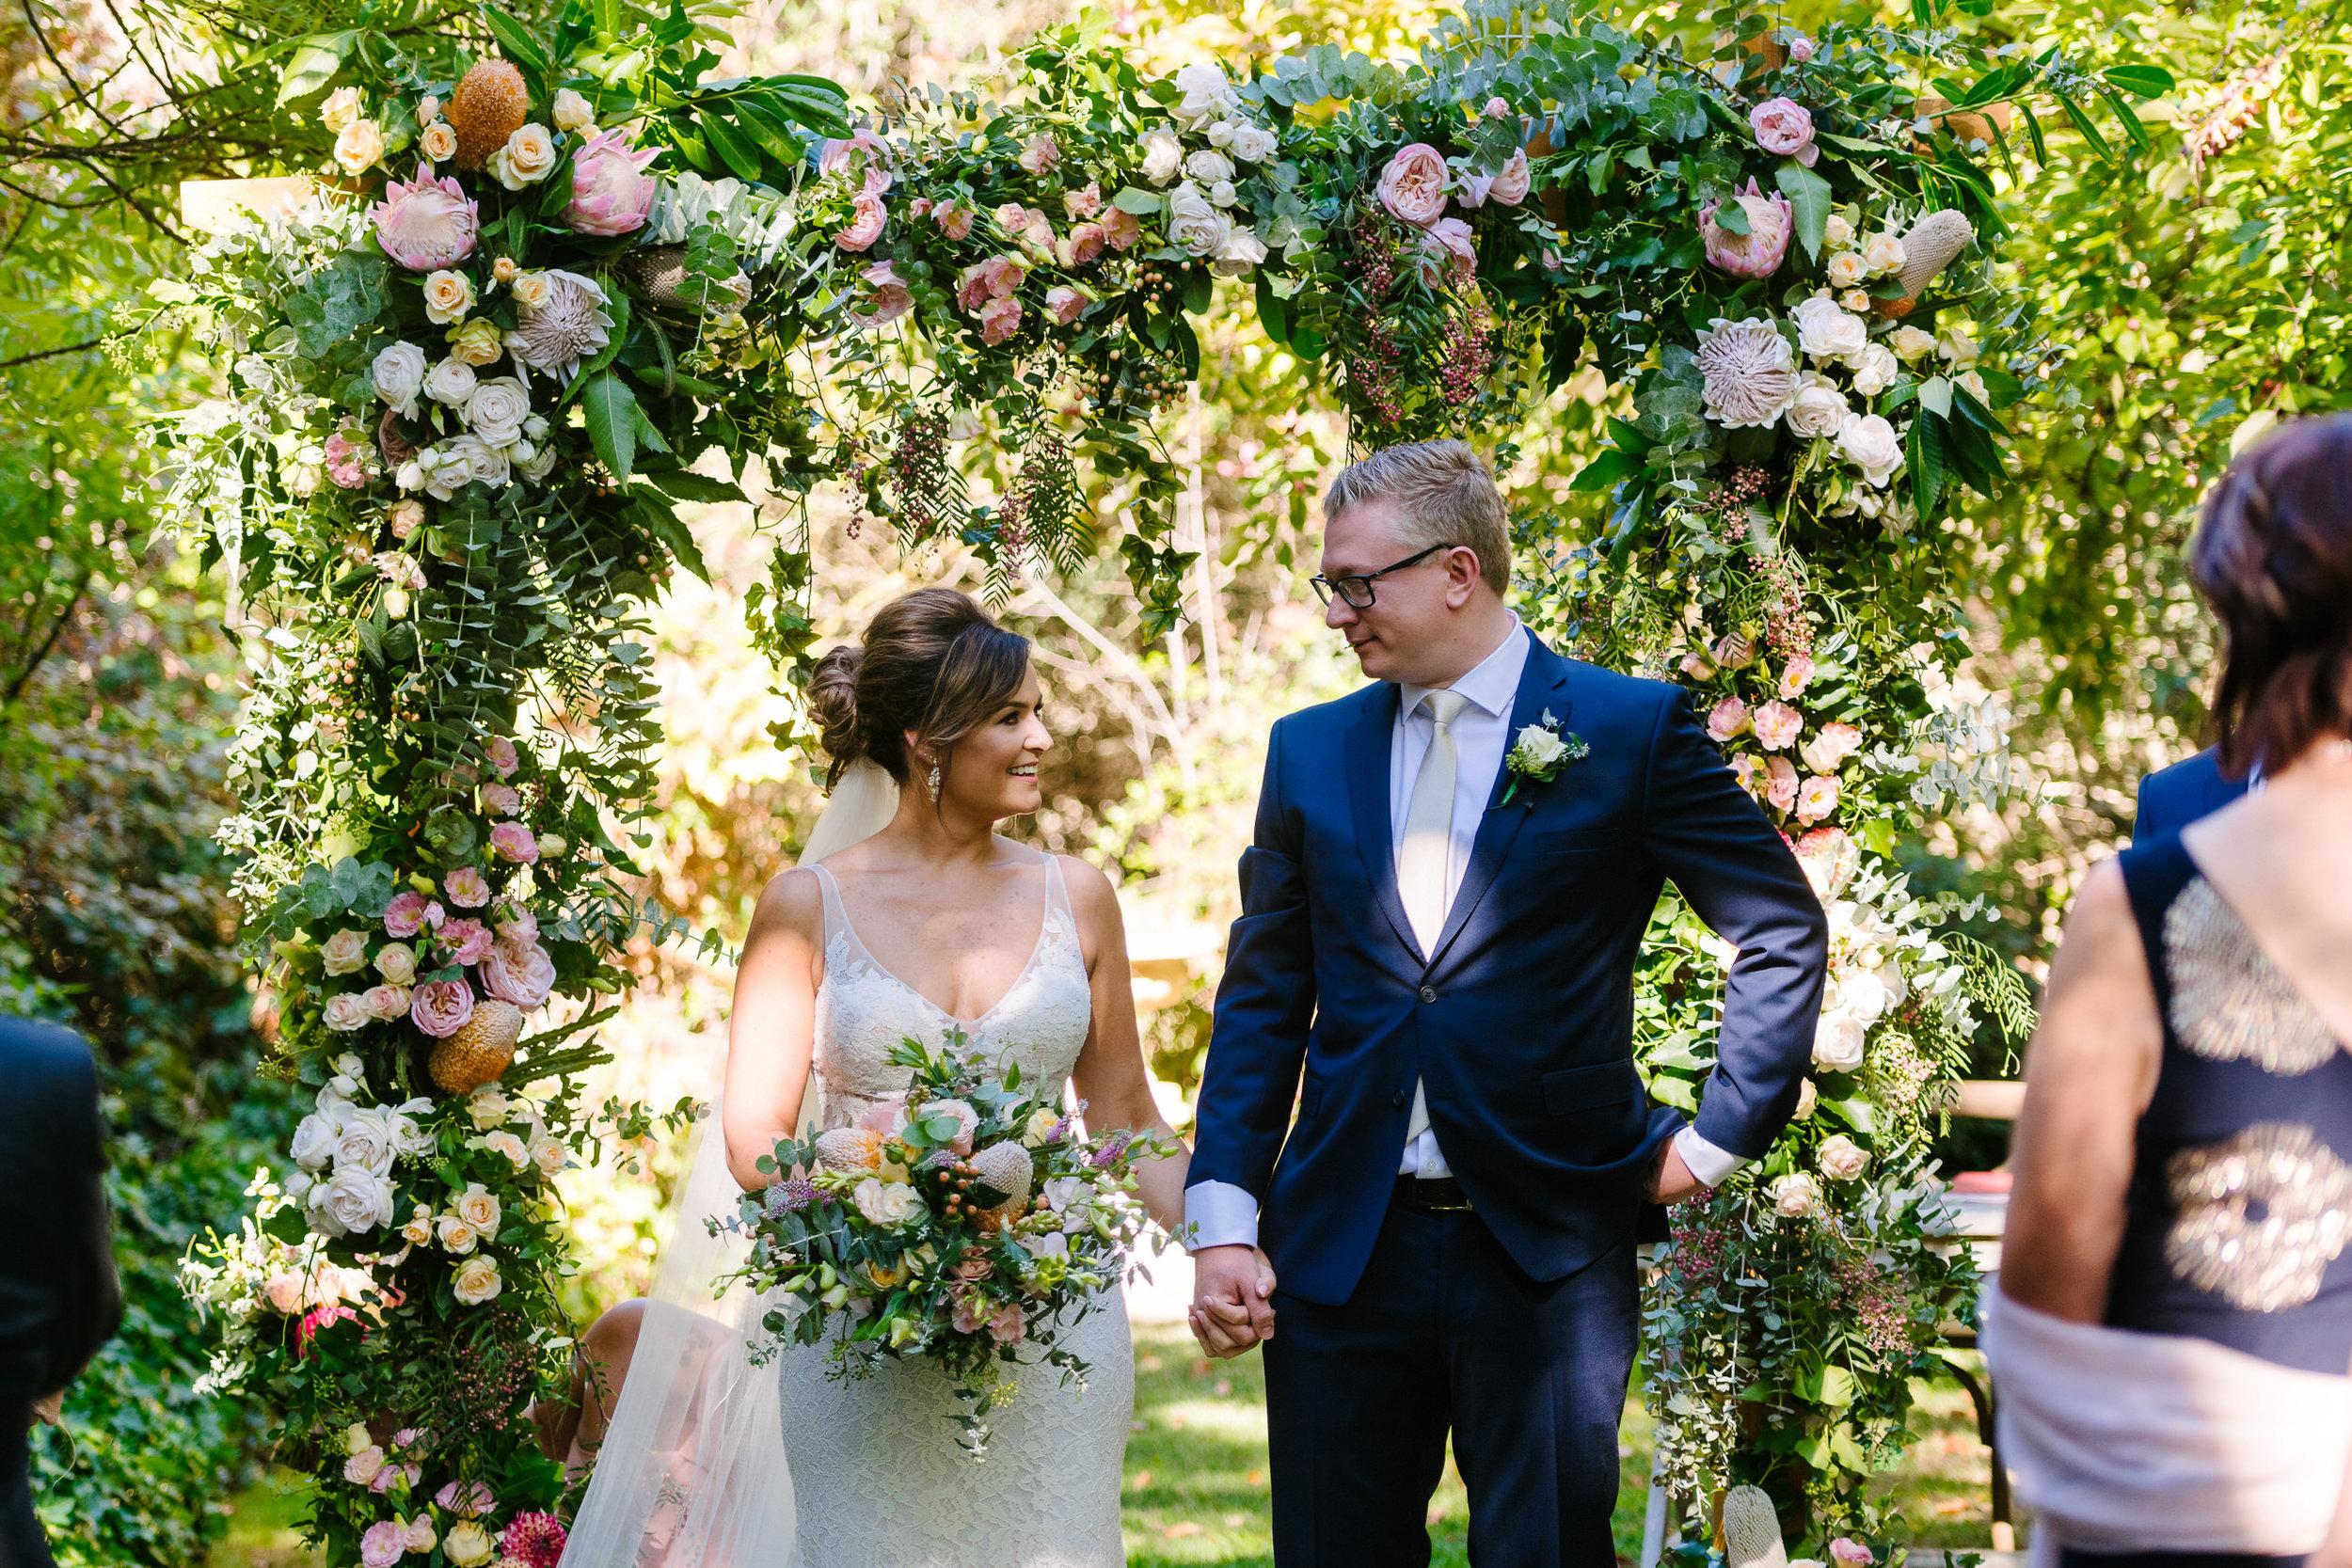 Justin_And_Jim_Photography_Chateau_Dore_Bendigo_Wedding33.JPG